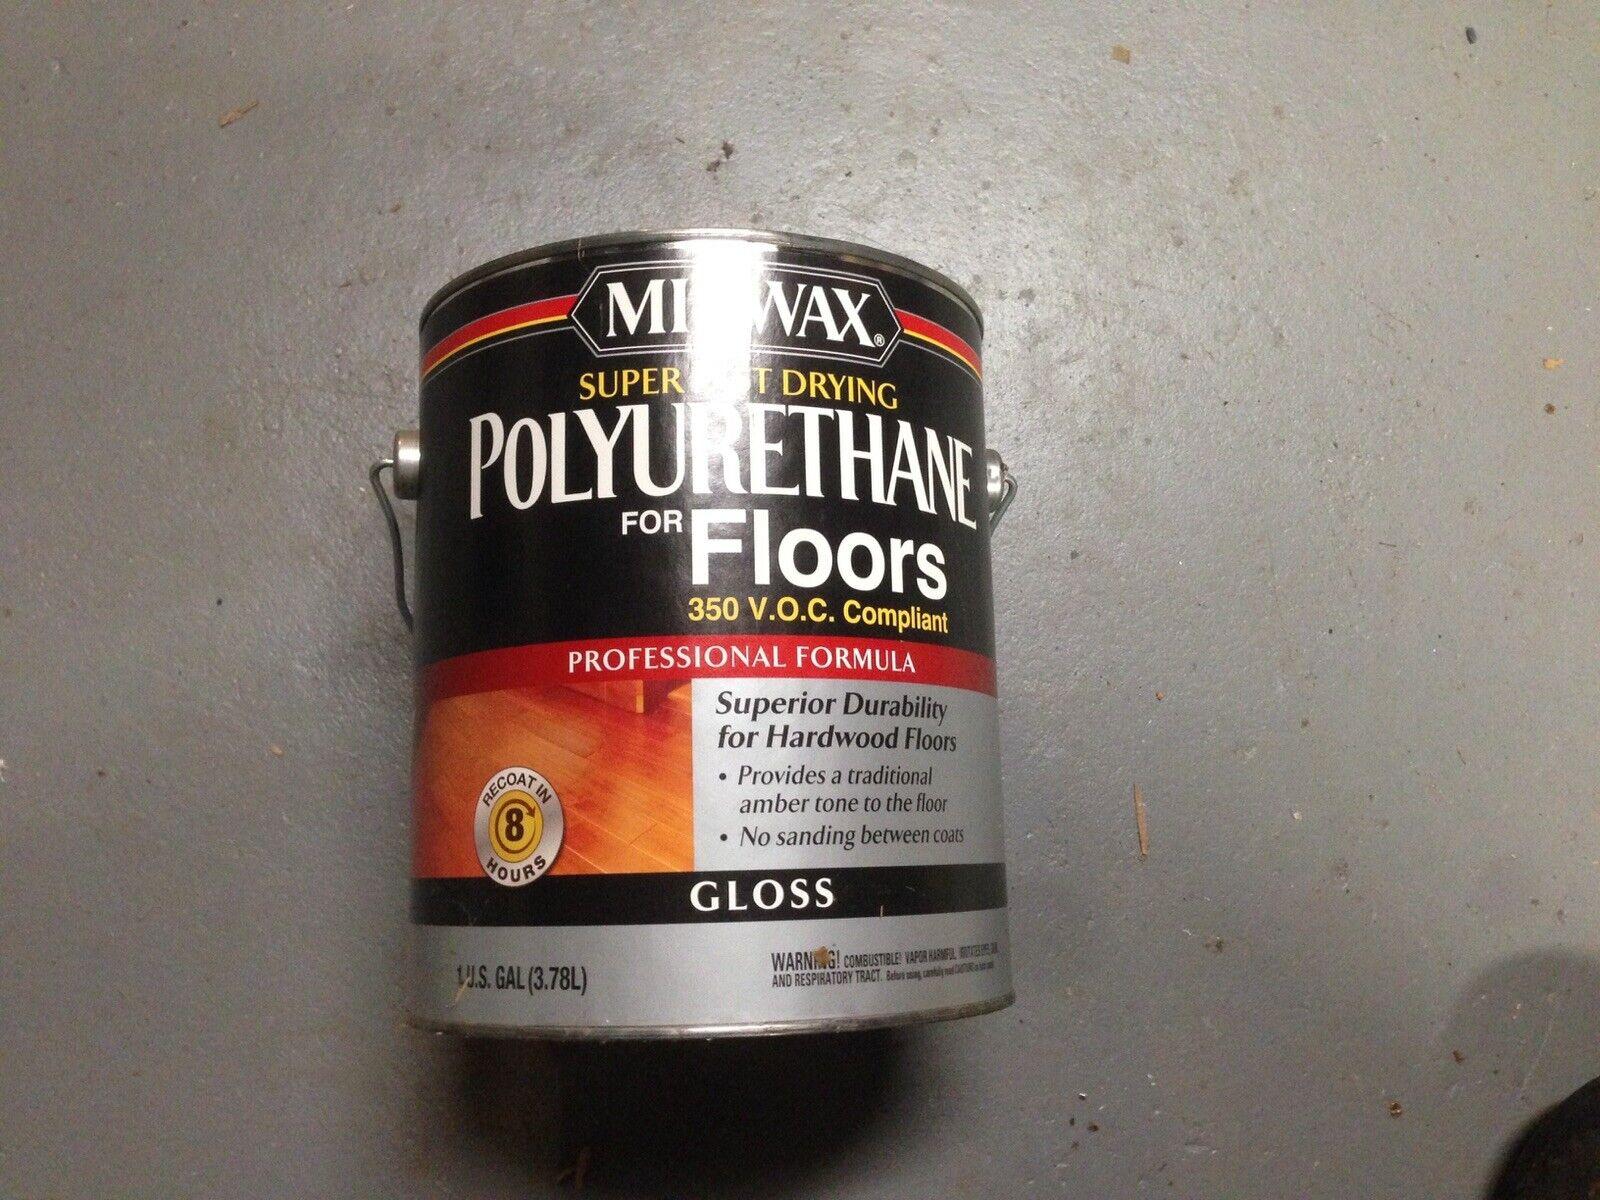 Minwax 13020000 Super Fast Drying Polyurethane For Floors 1 Gallon Gloss For Sale Online Ebay